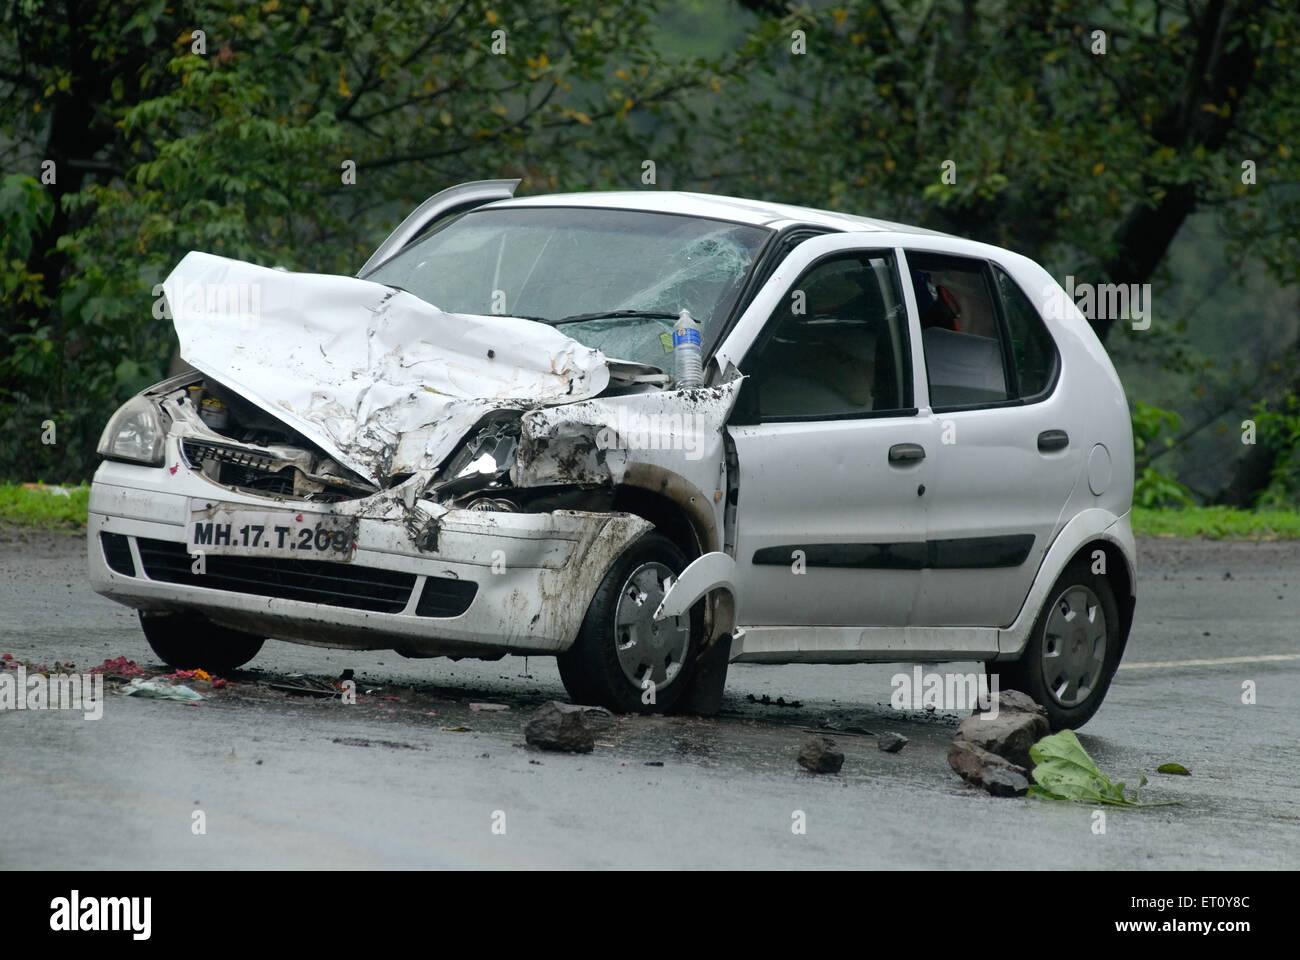 Car damage by accident at Malshej Ghat ; Maharashtra ; India - Stock Image